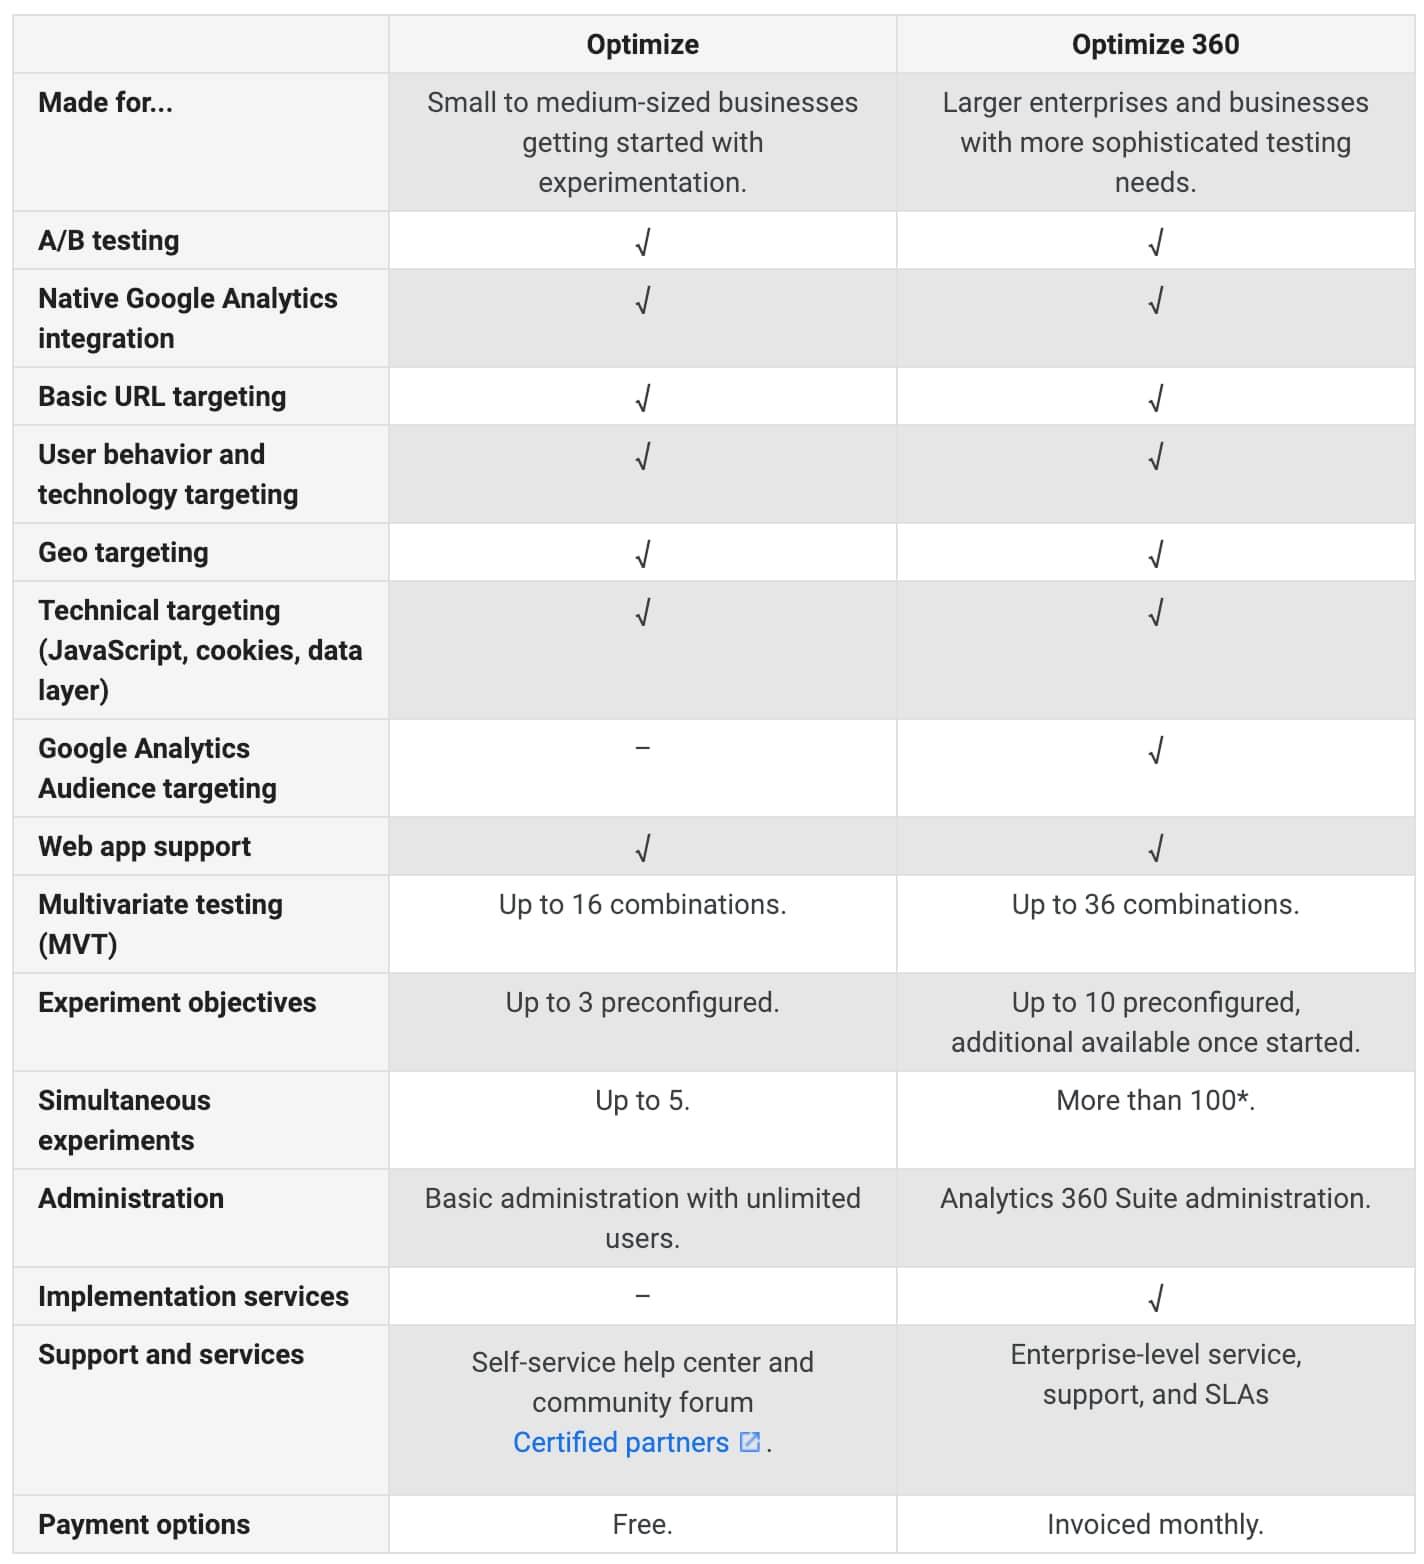 Google Optimize versus Optimize 360